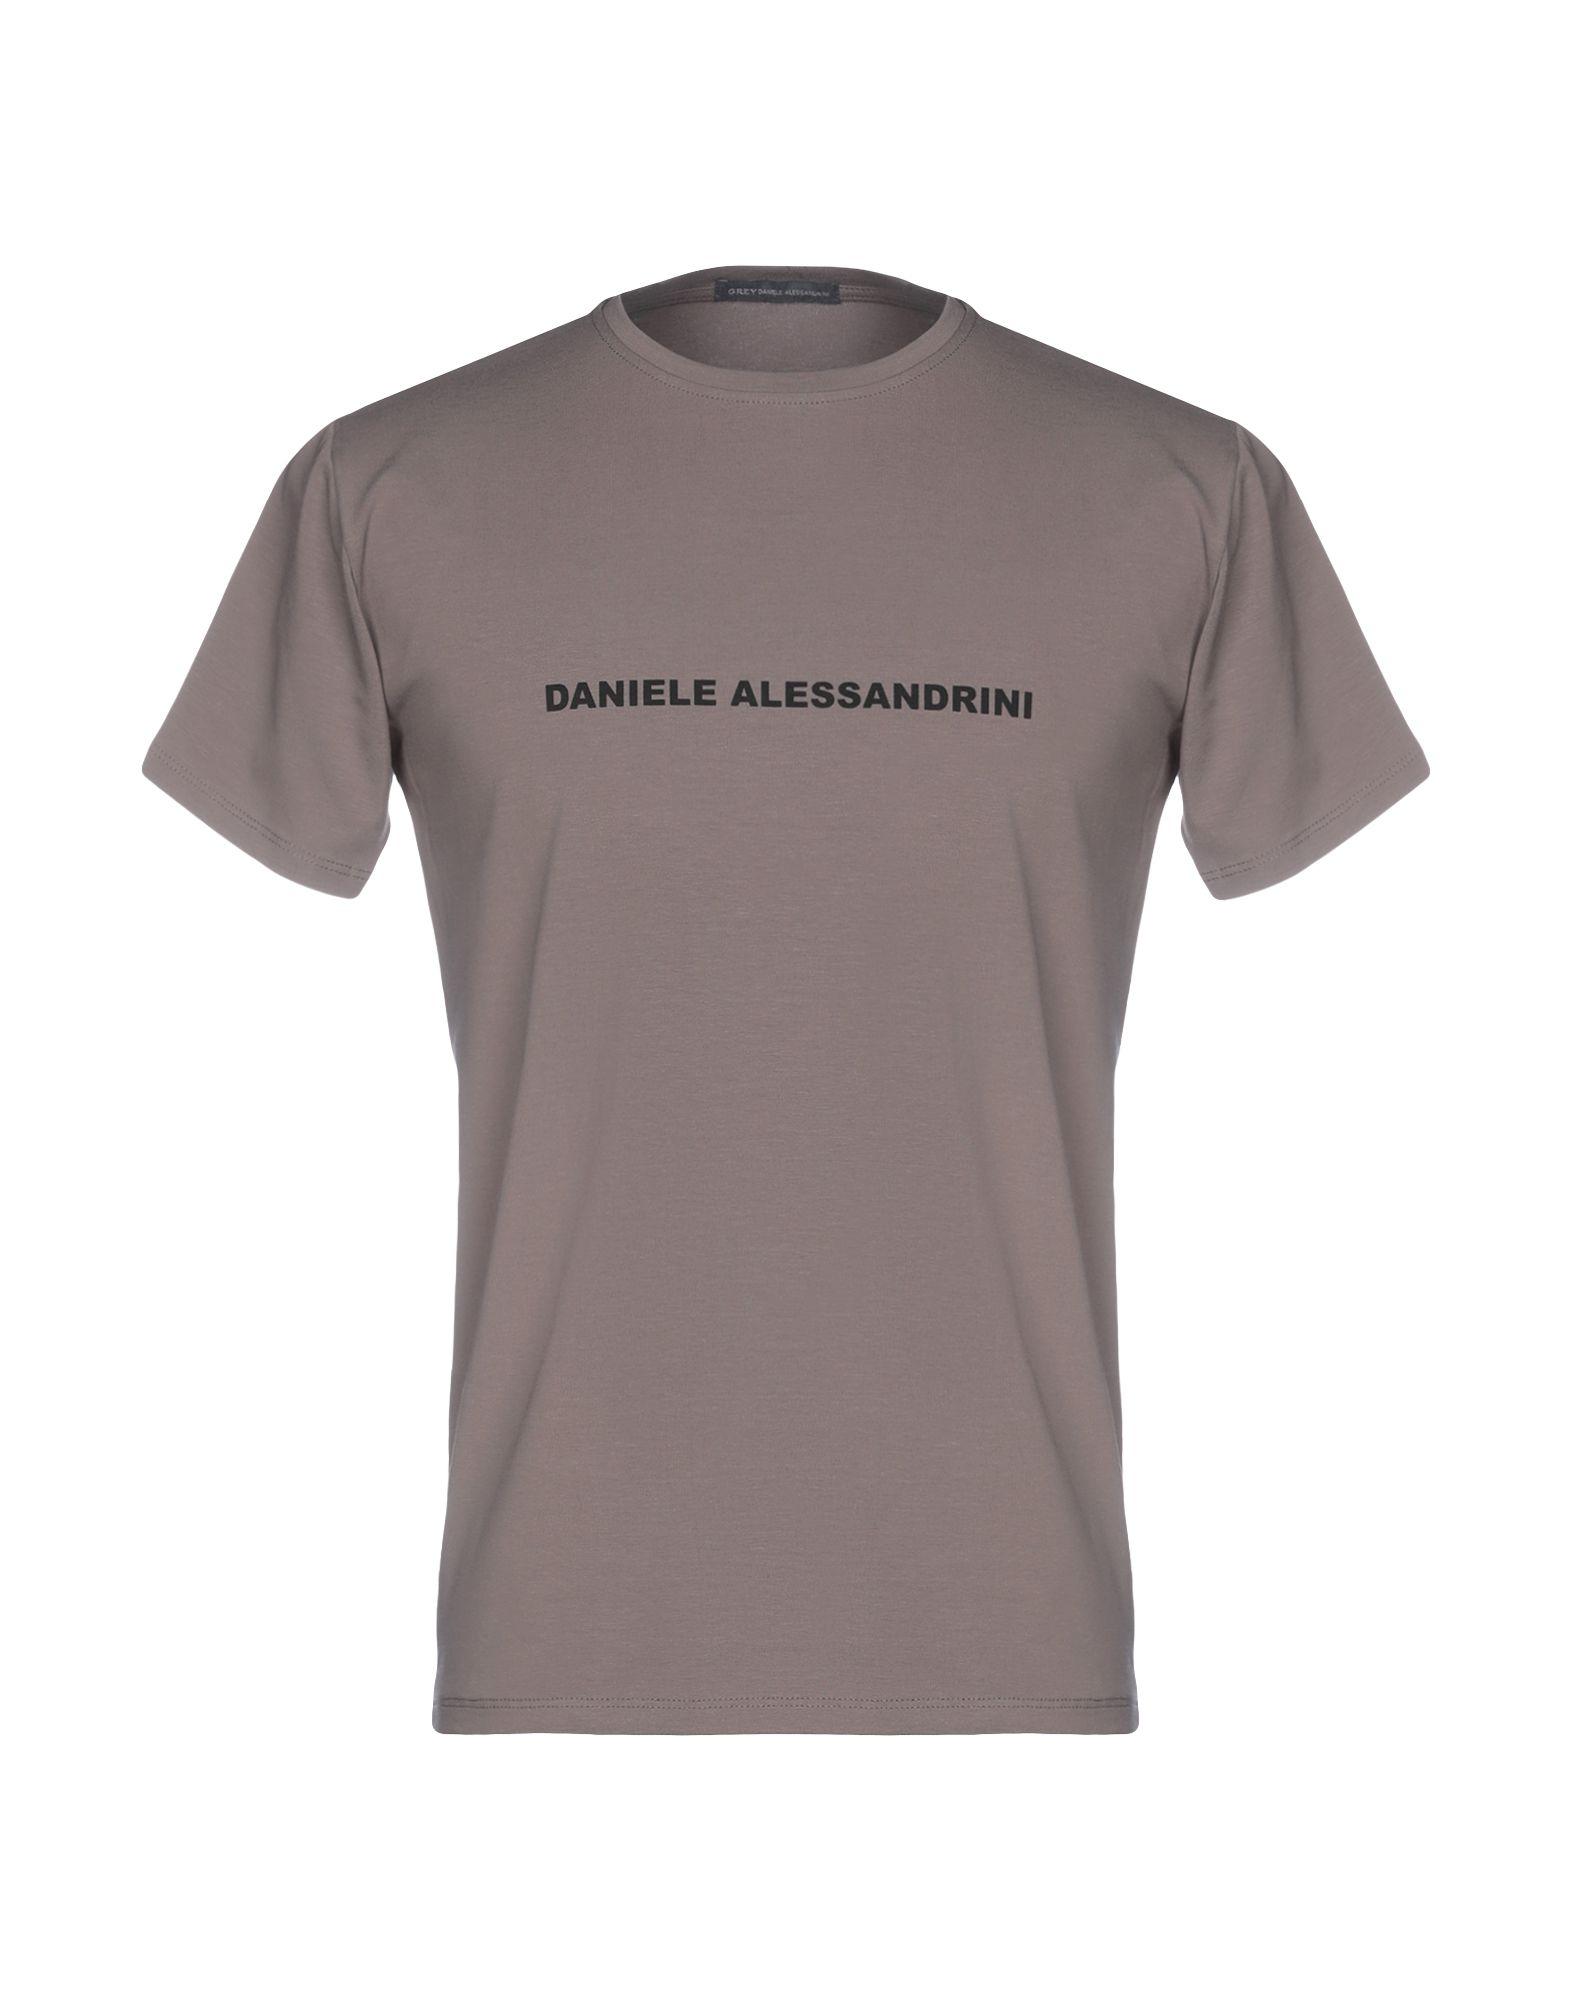 T-Shirt T-Shirt Daniele Alessandrini uomo - 12243343BL  billig